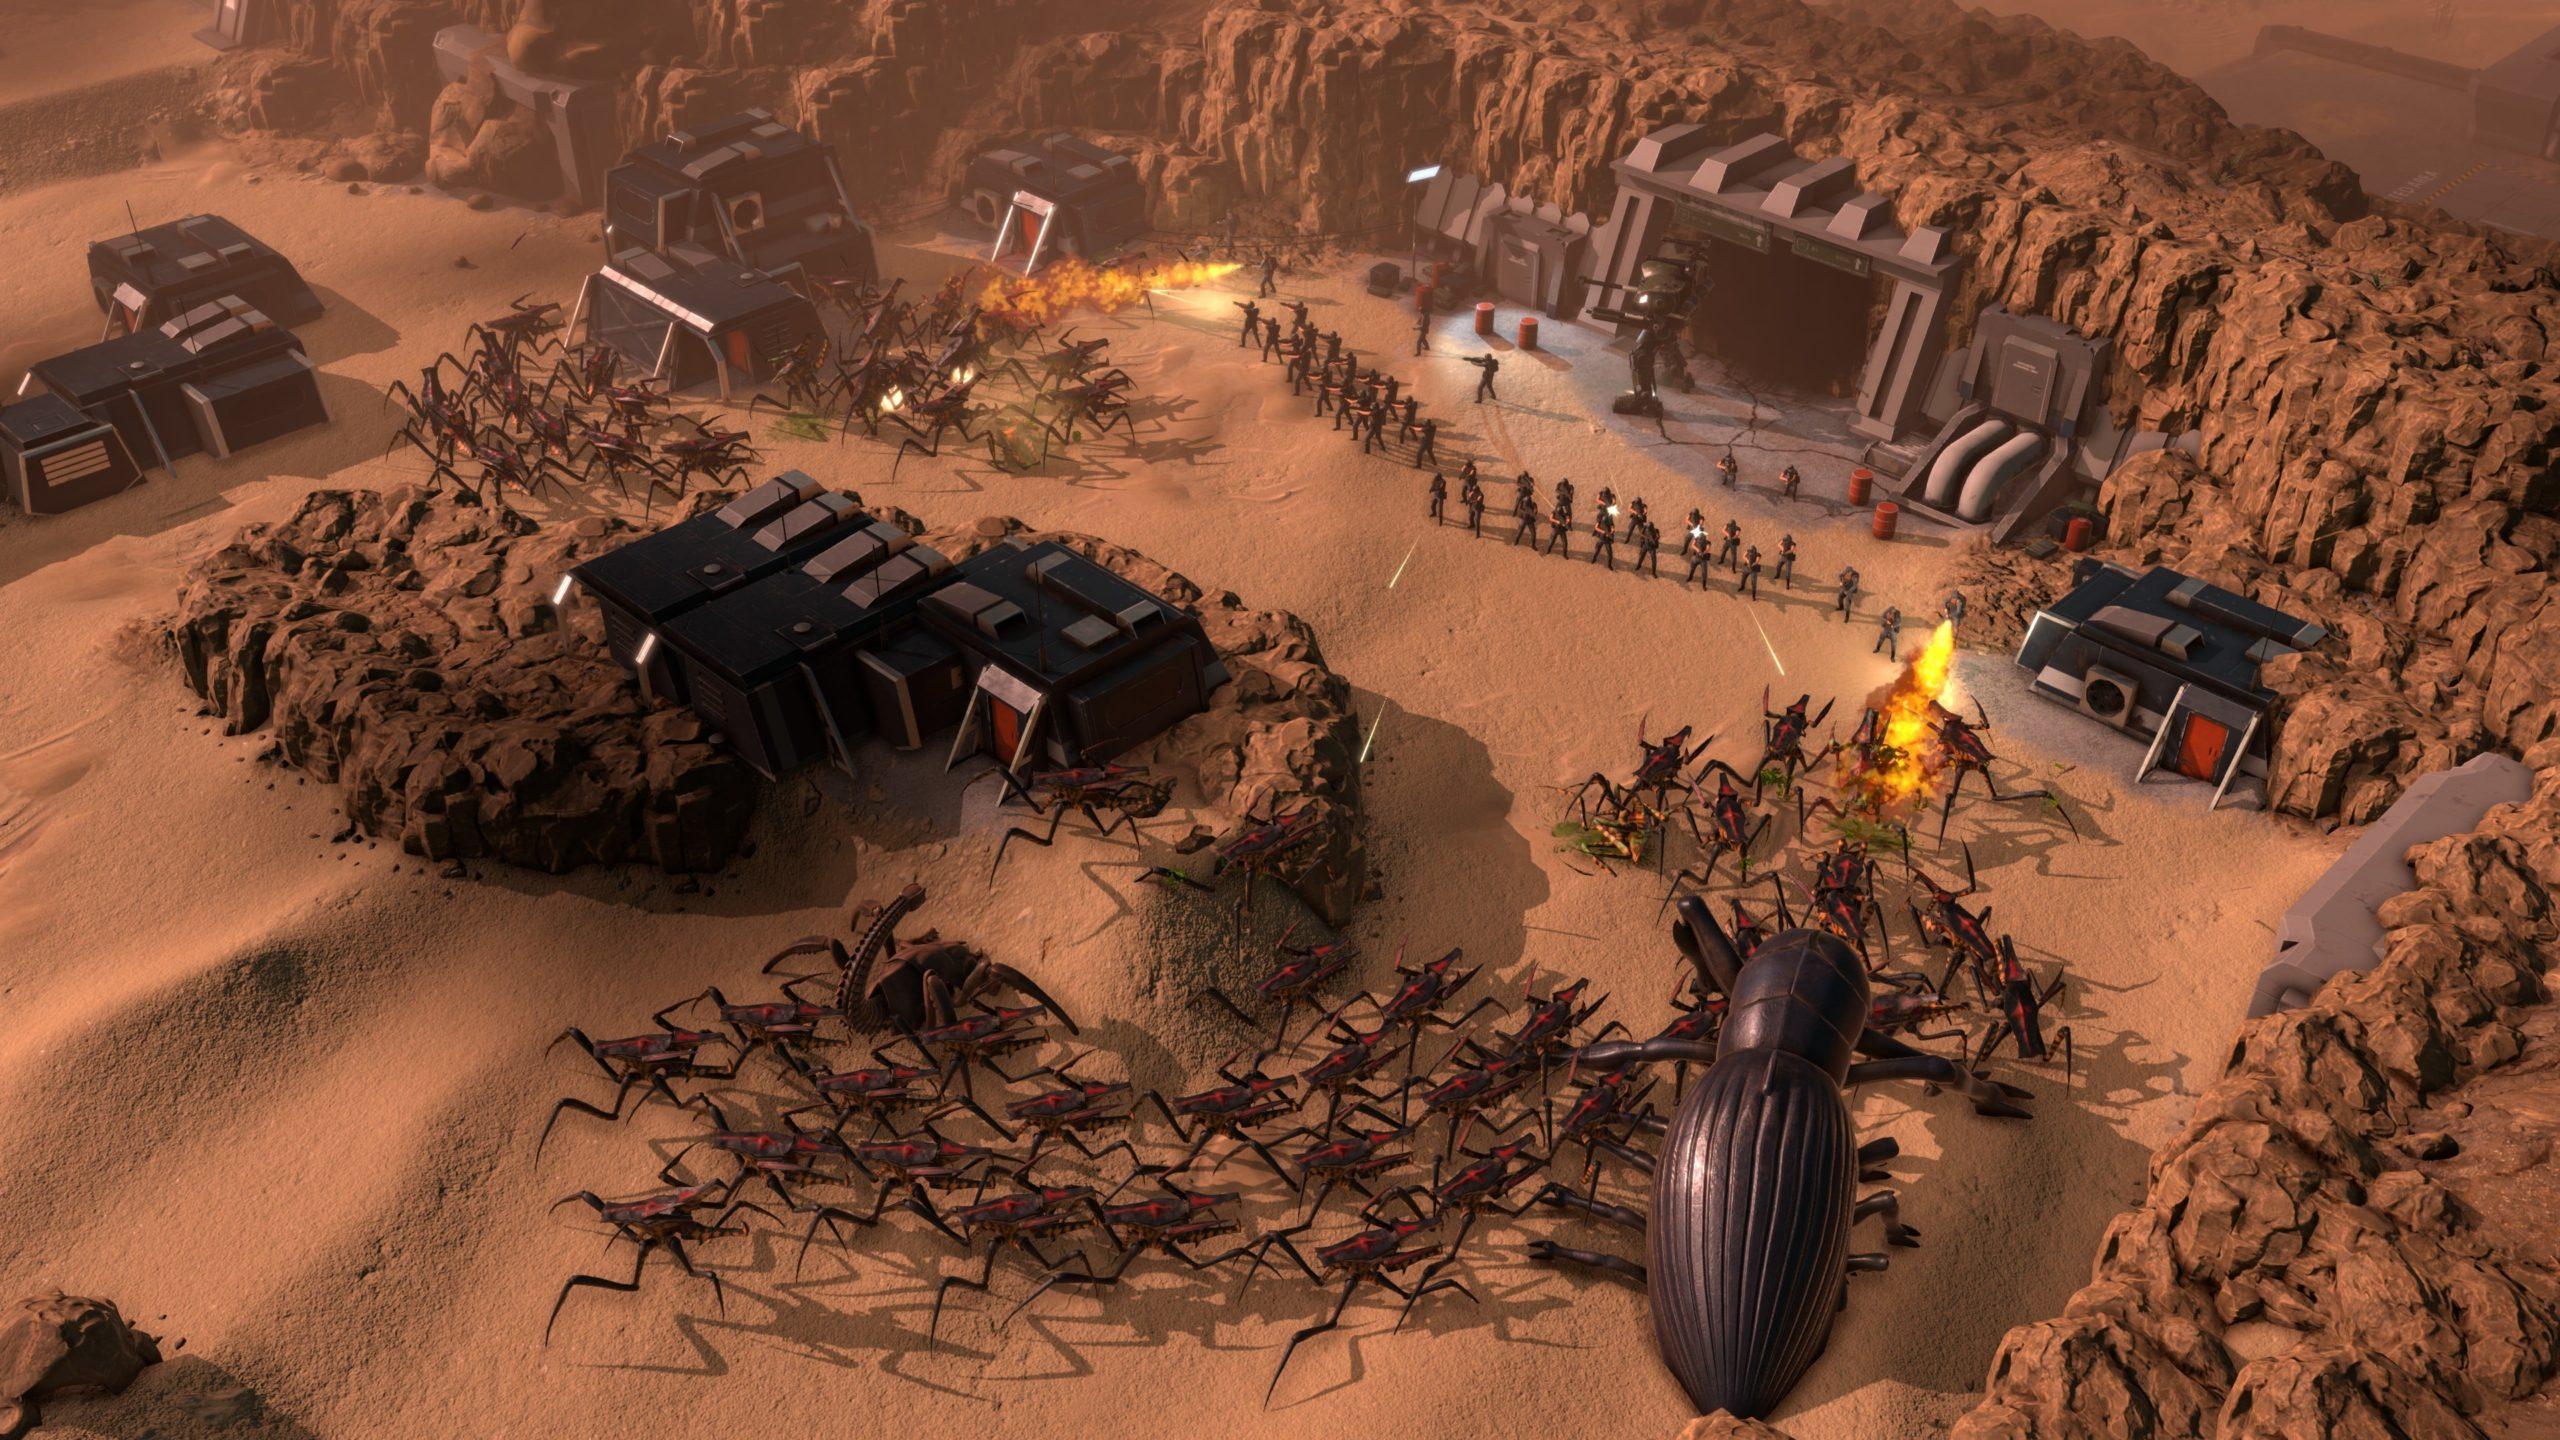 Boj v ulicích ve hře Starship Troopers: Terran Command ss 234058a0387ec4a4908ea12d242ddd2ee114afcc min scaled